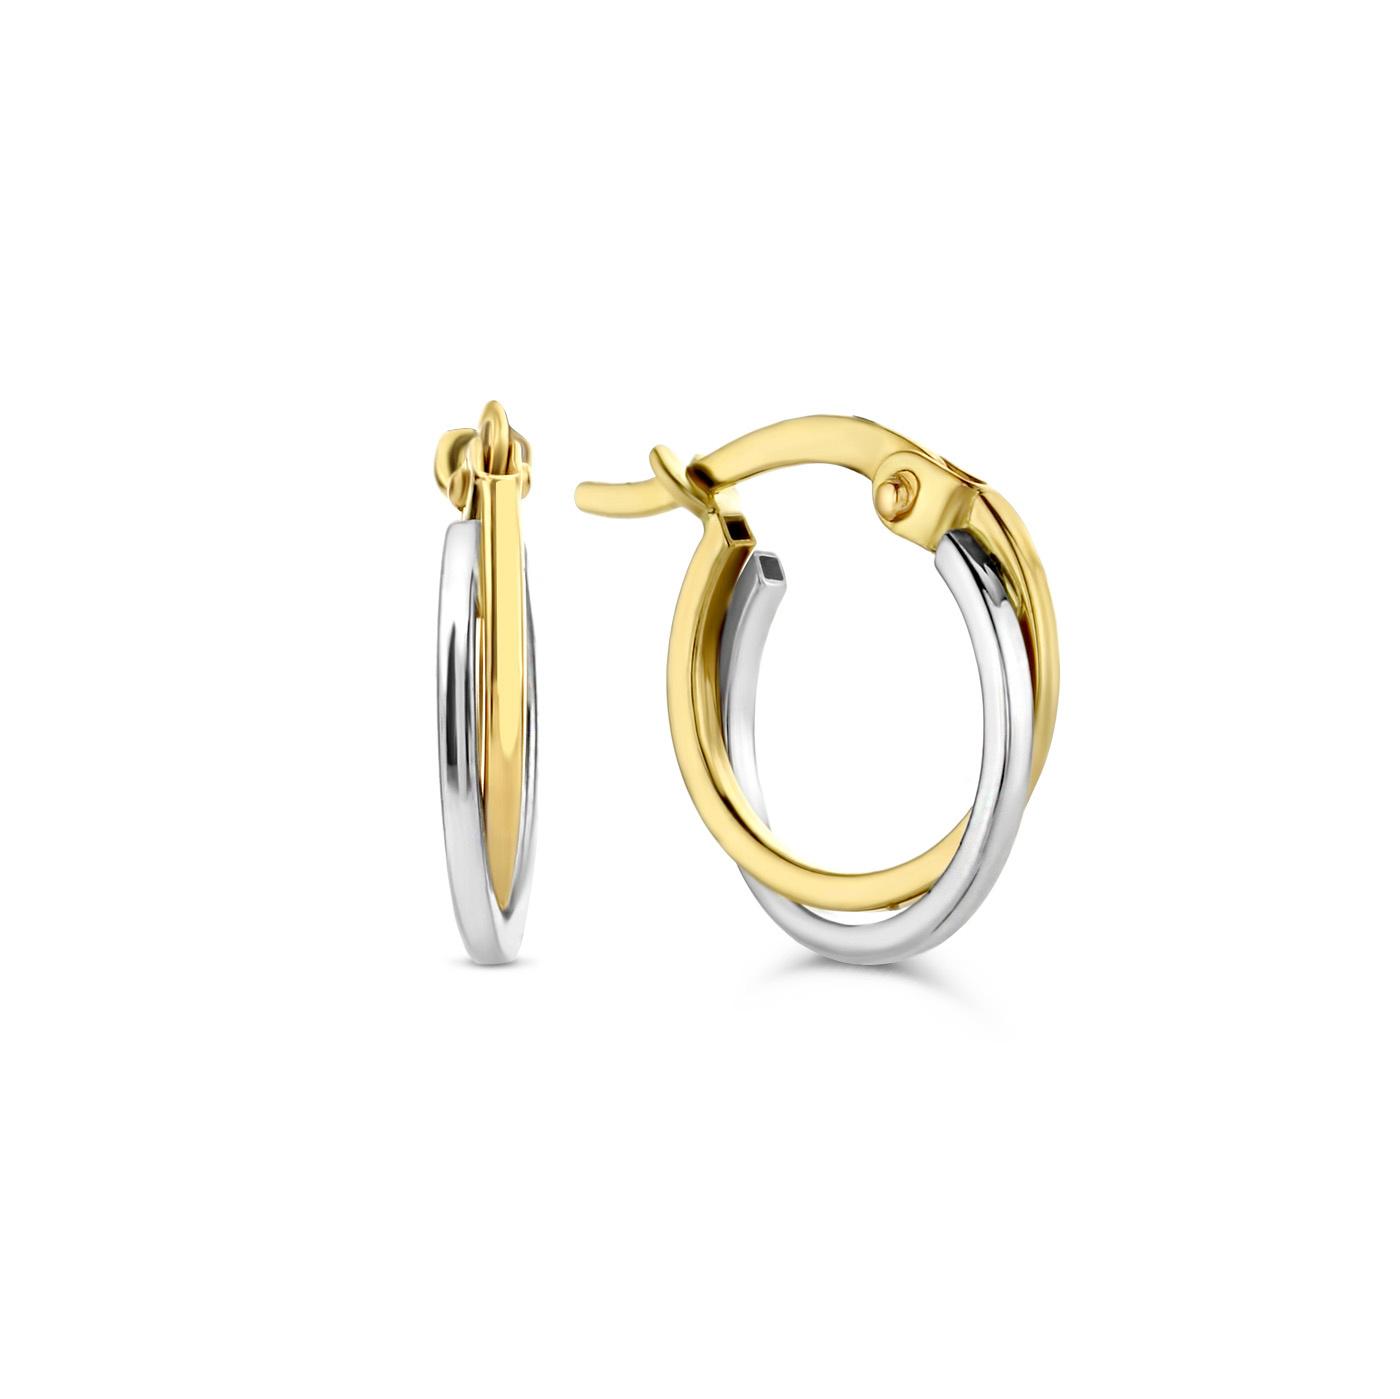 Isabel Bernard Le Marais Adame 14 karat gold hoop earrings